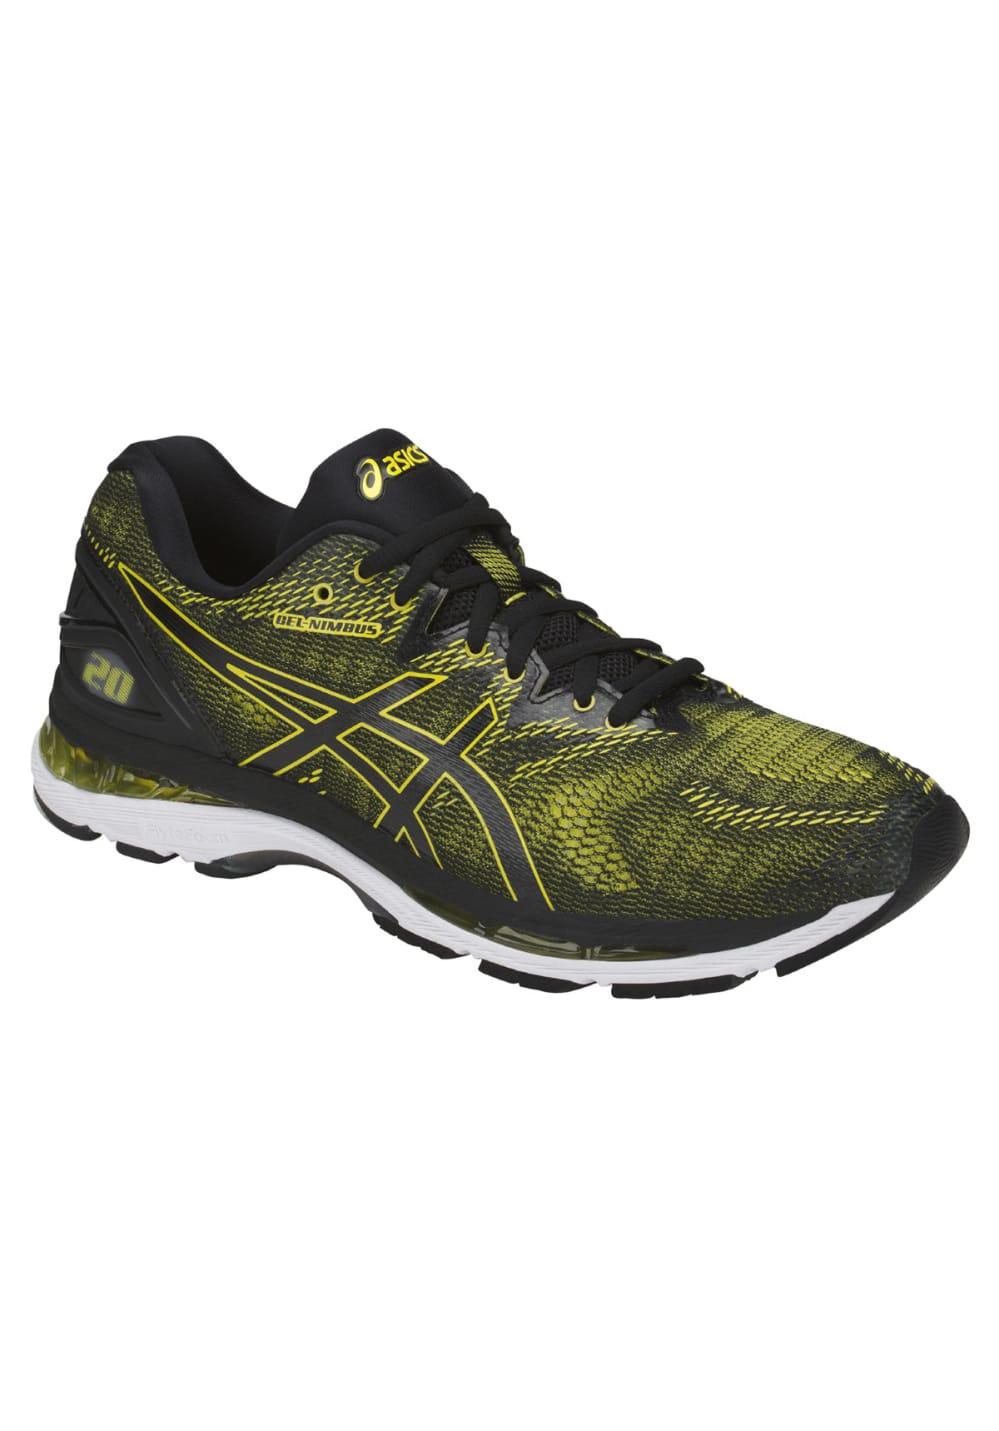 info pour 34a6e 94540 ASICS GEL-Nimbus 20 - Running shoes for Men - Black